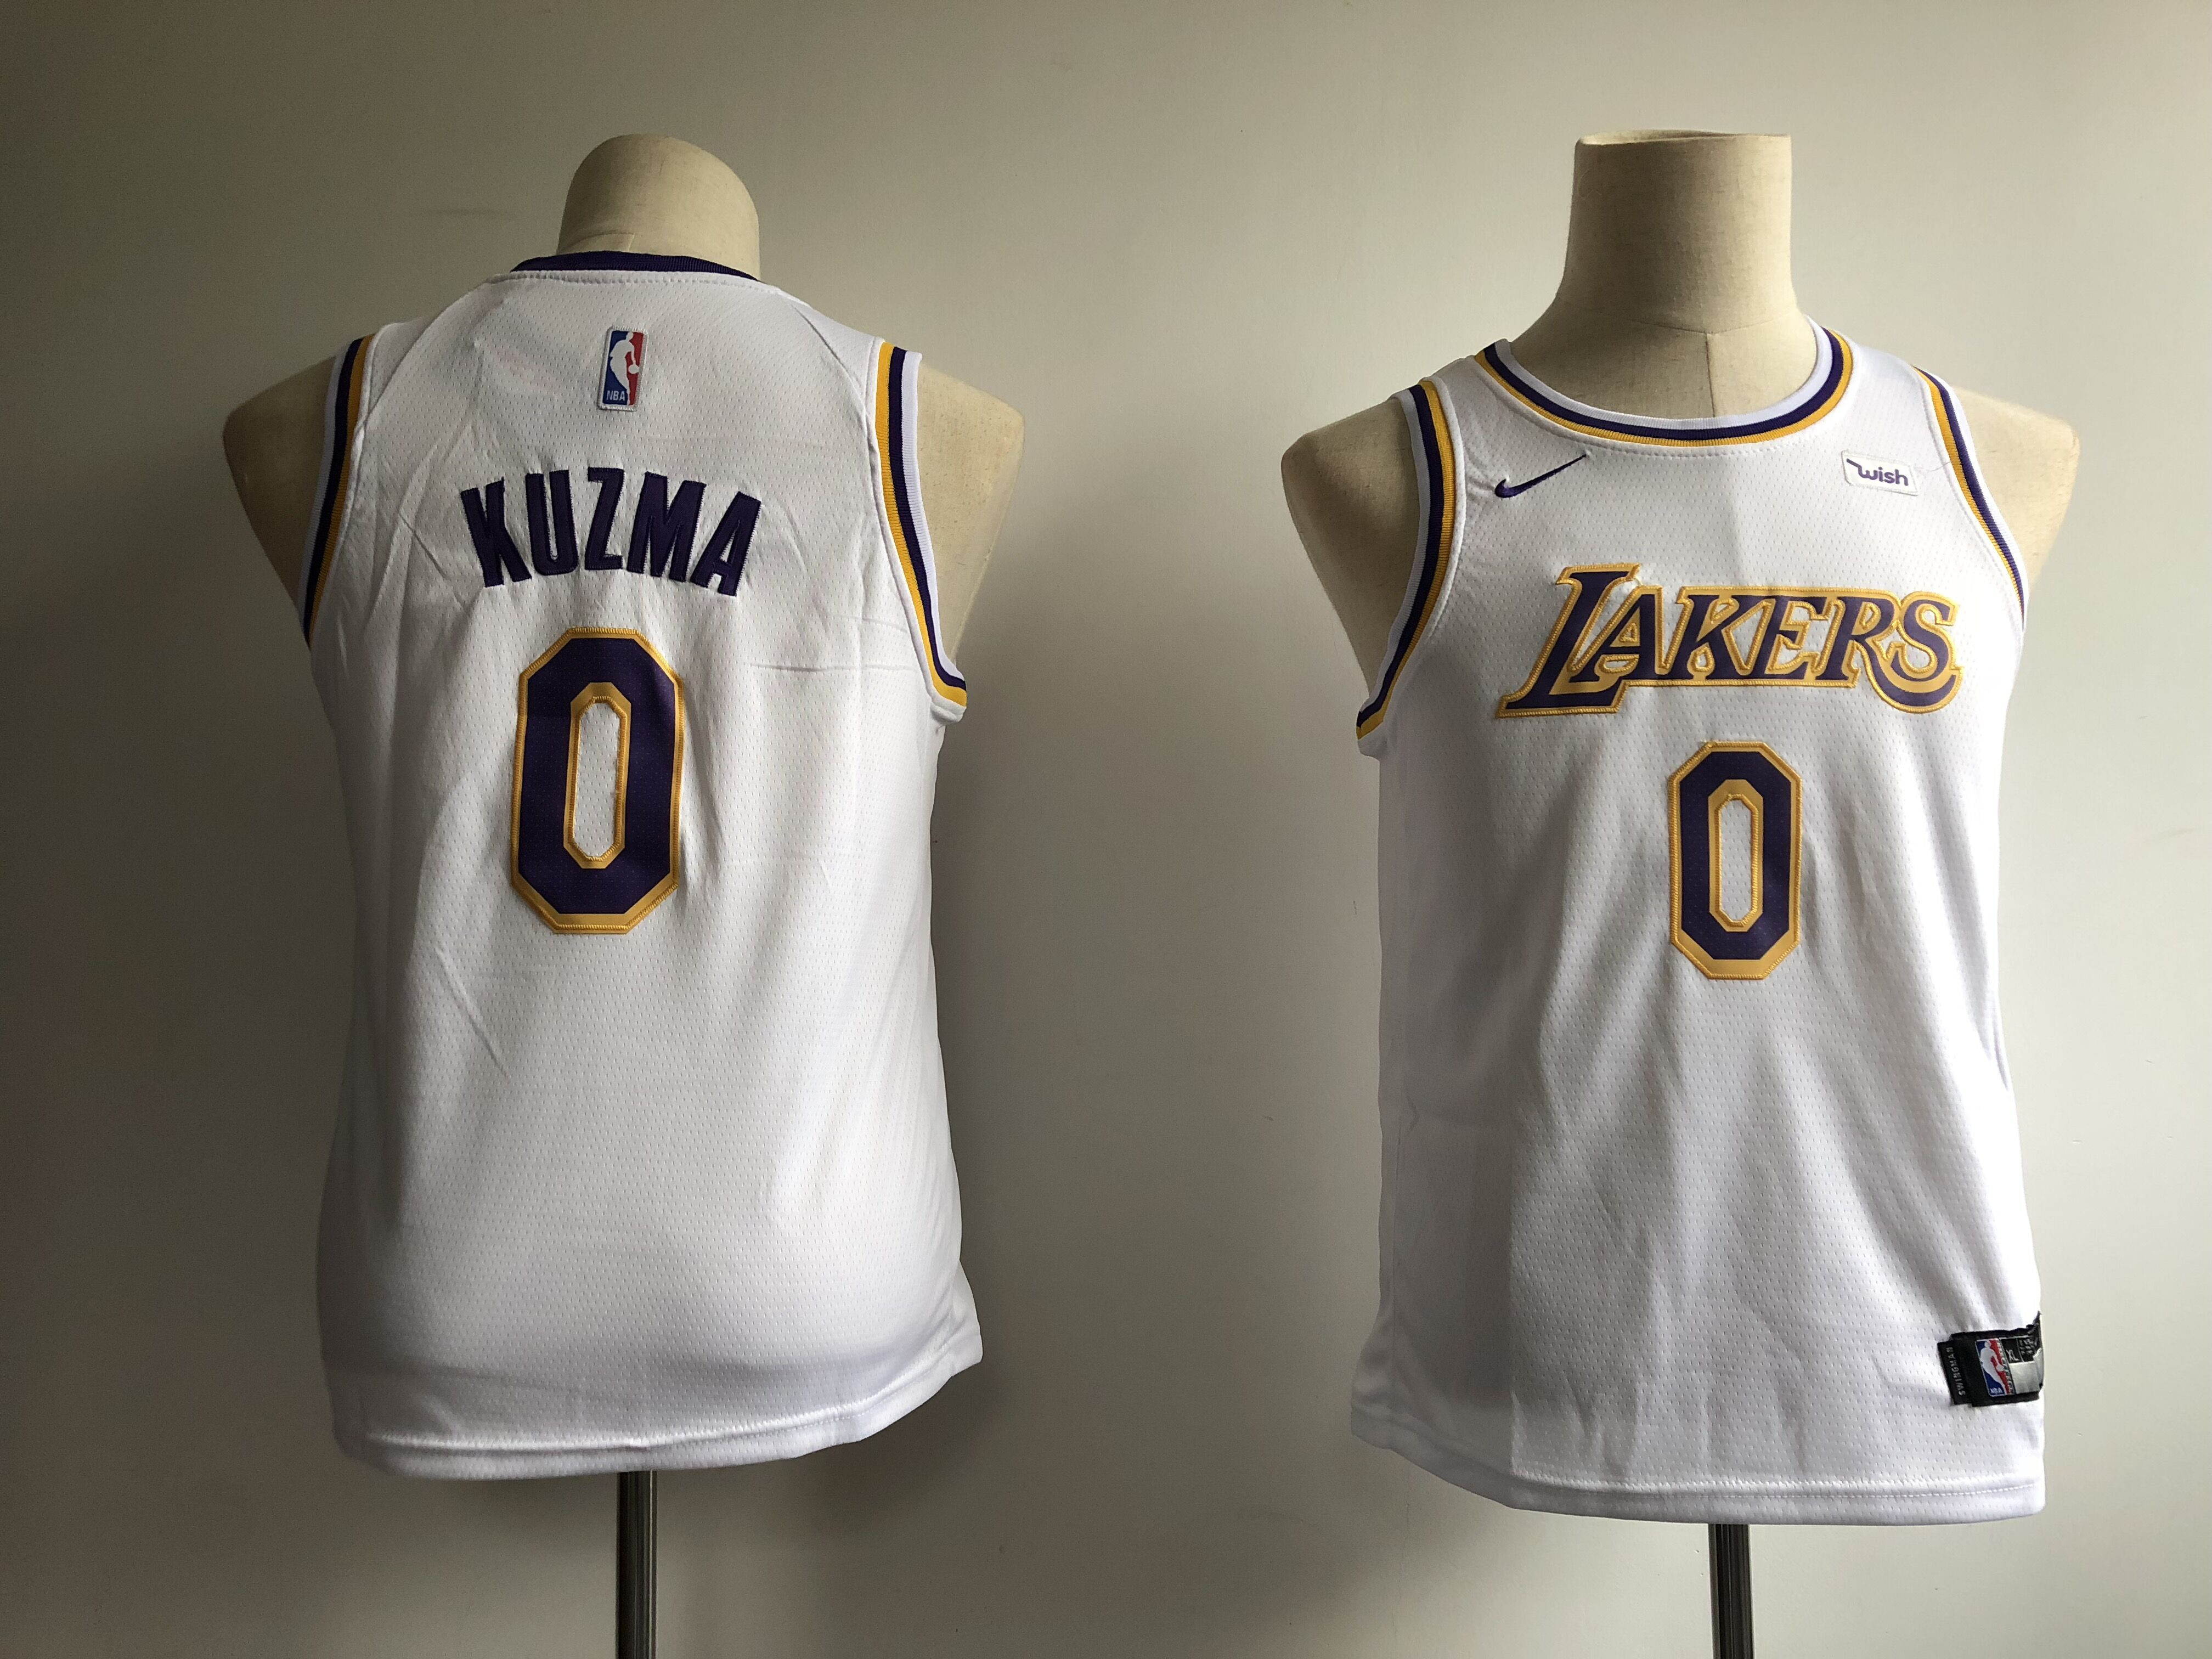 Lakers 0 Kyle Kuzma White Youth 2018-19 Nike Swingman Jersey